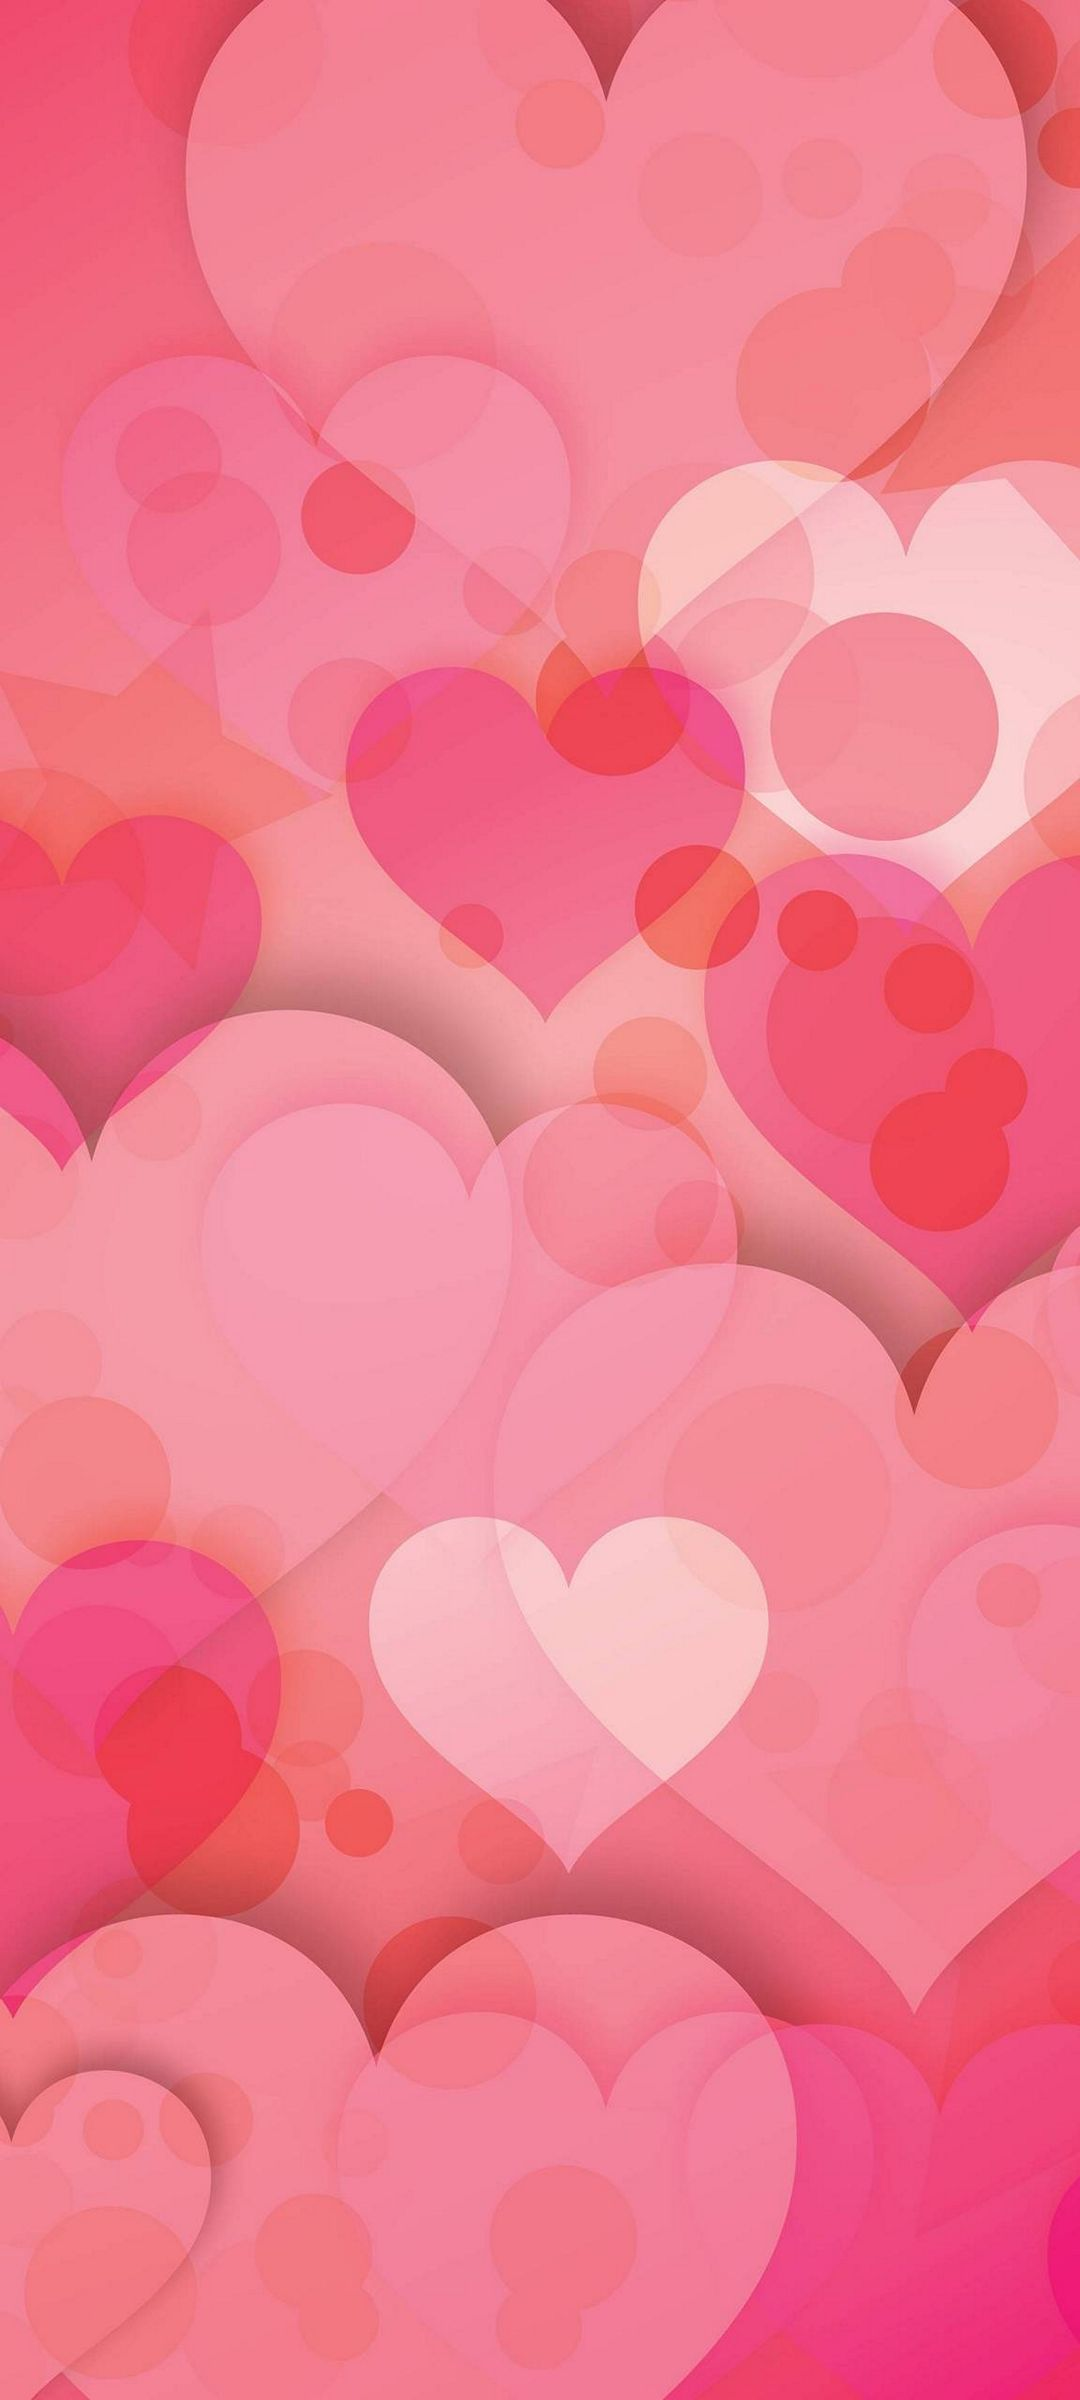 Hearts Love Pinky